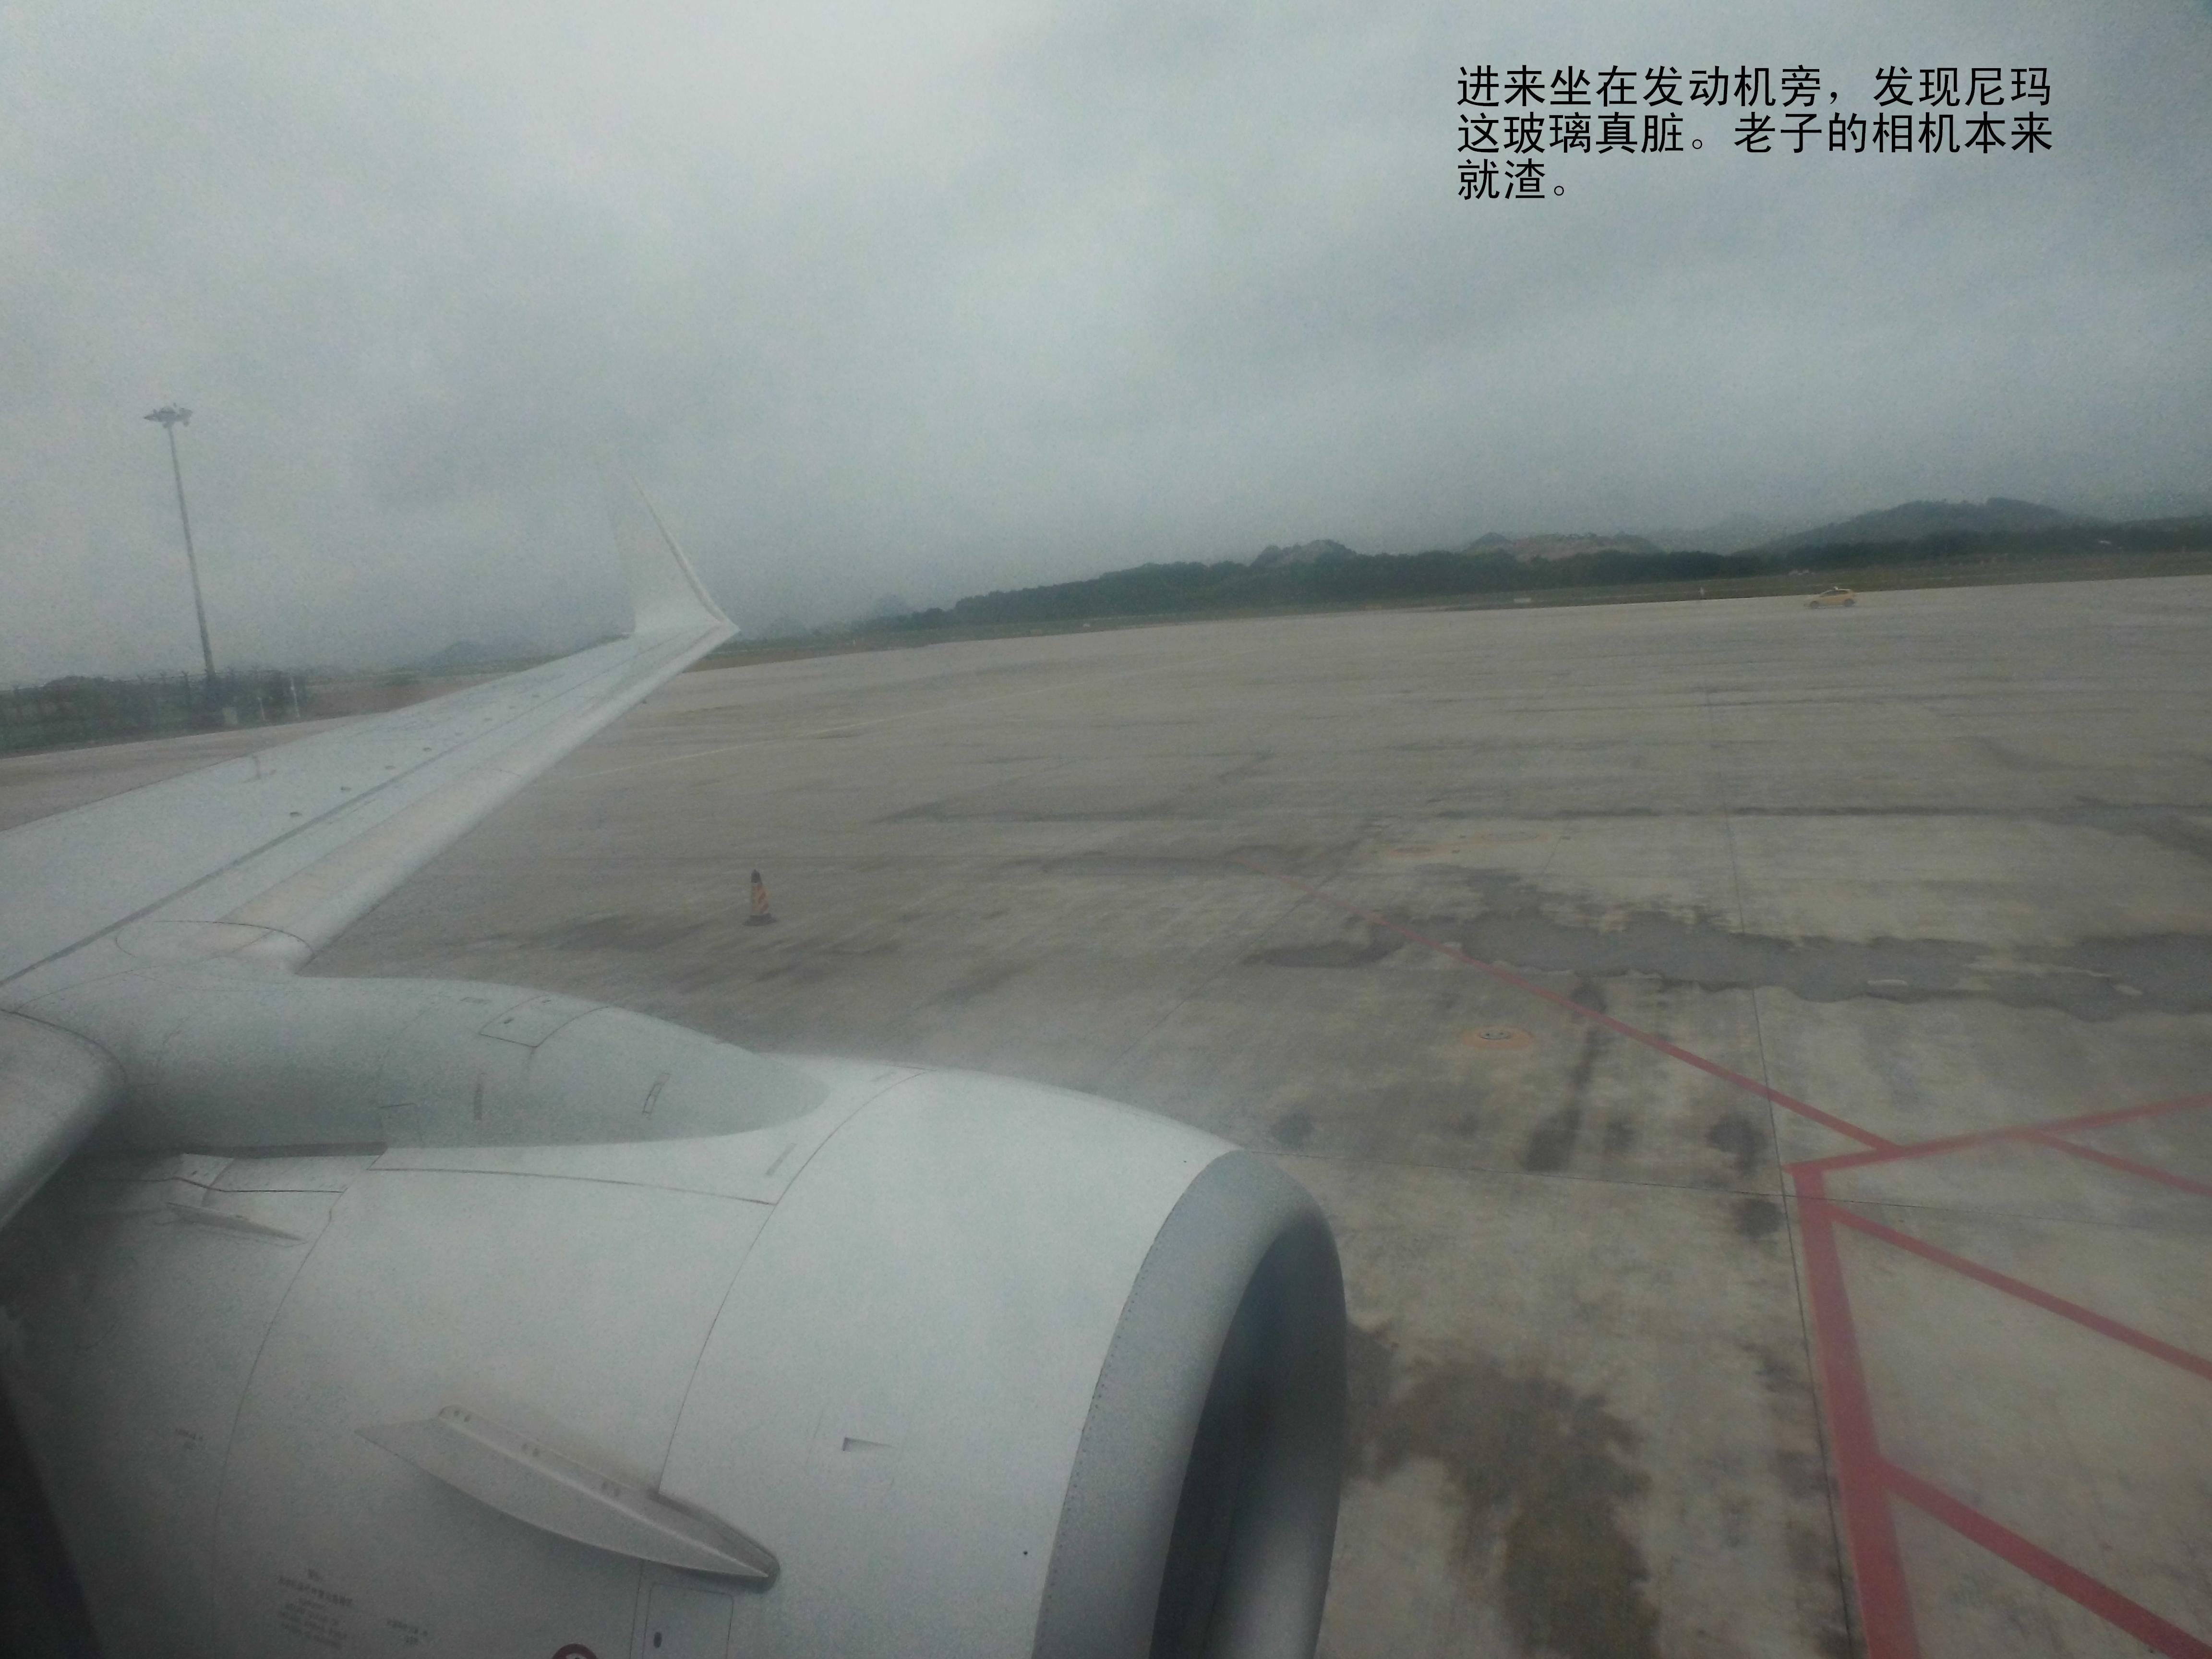 Re:[原创]新手第一帖(送女儿上大学)照片太大不知道怎样缩小,请各位看官自己缩小到25%欣赏 BOEING 737-800 B-5792 客舱